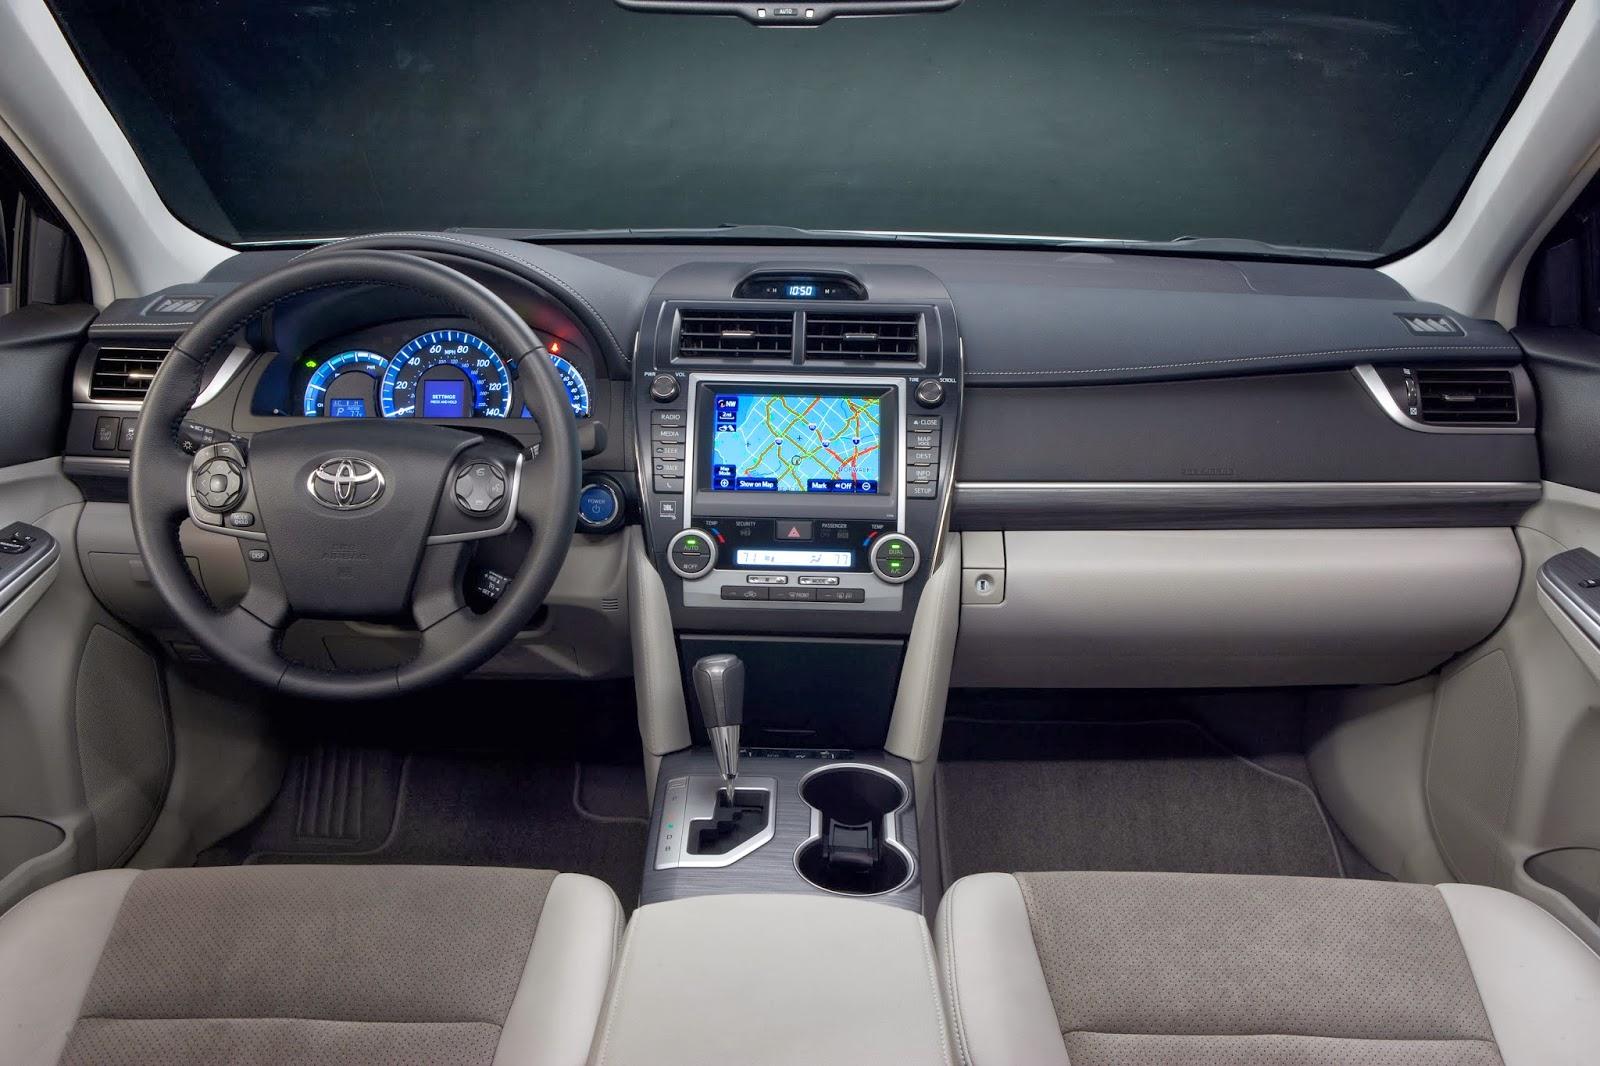 Interior View Of 2017 Toyota Camry Hybrid